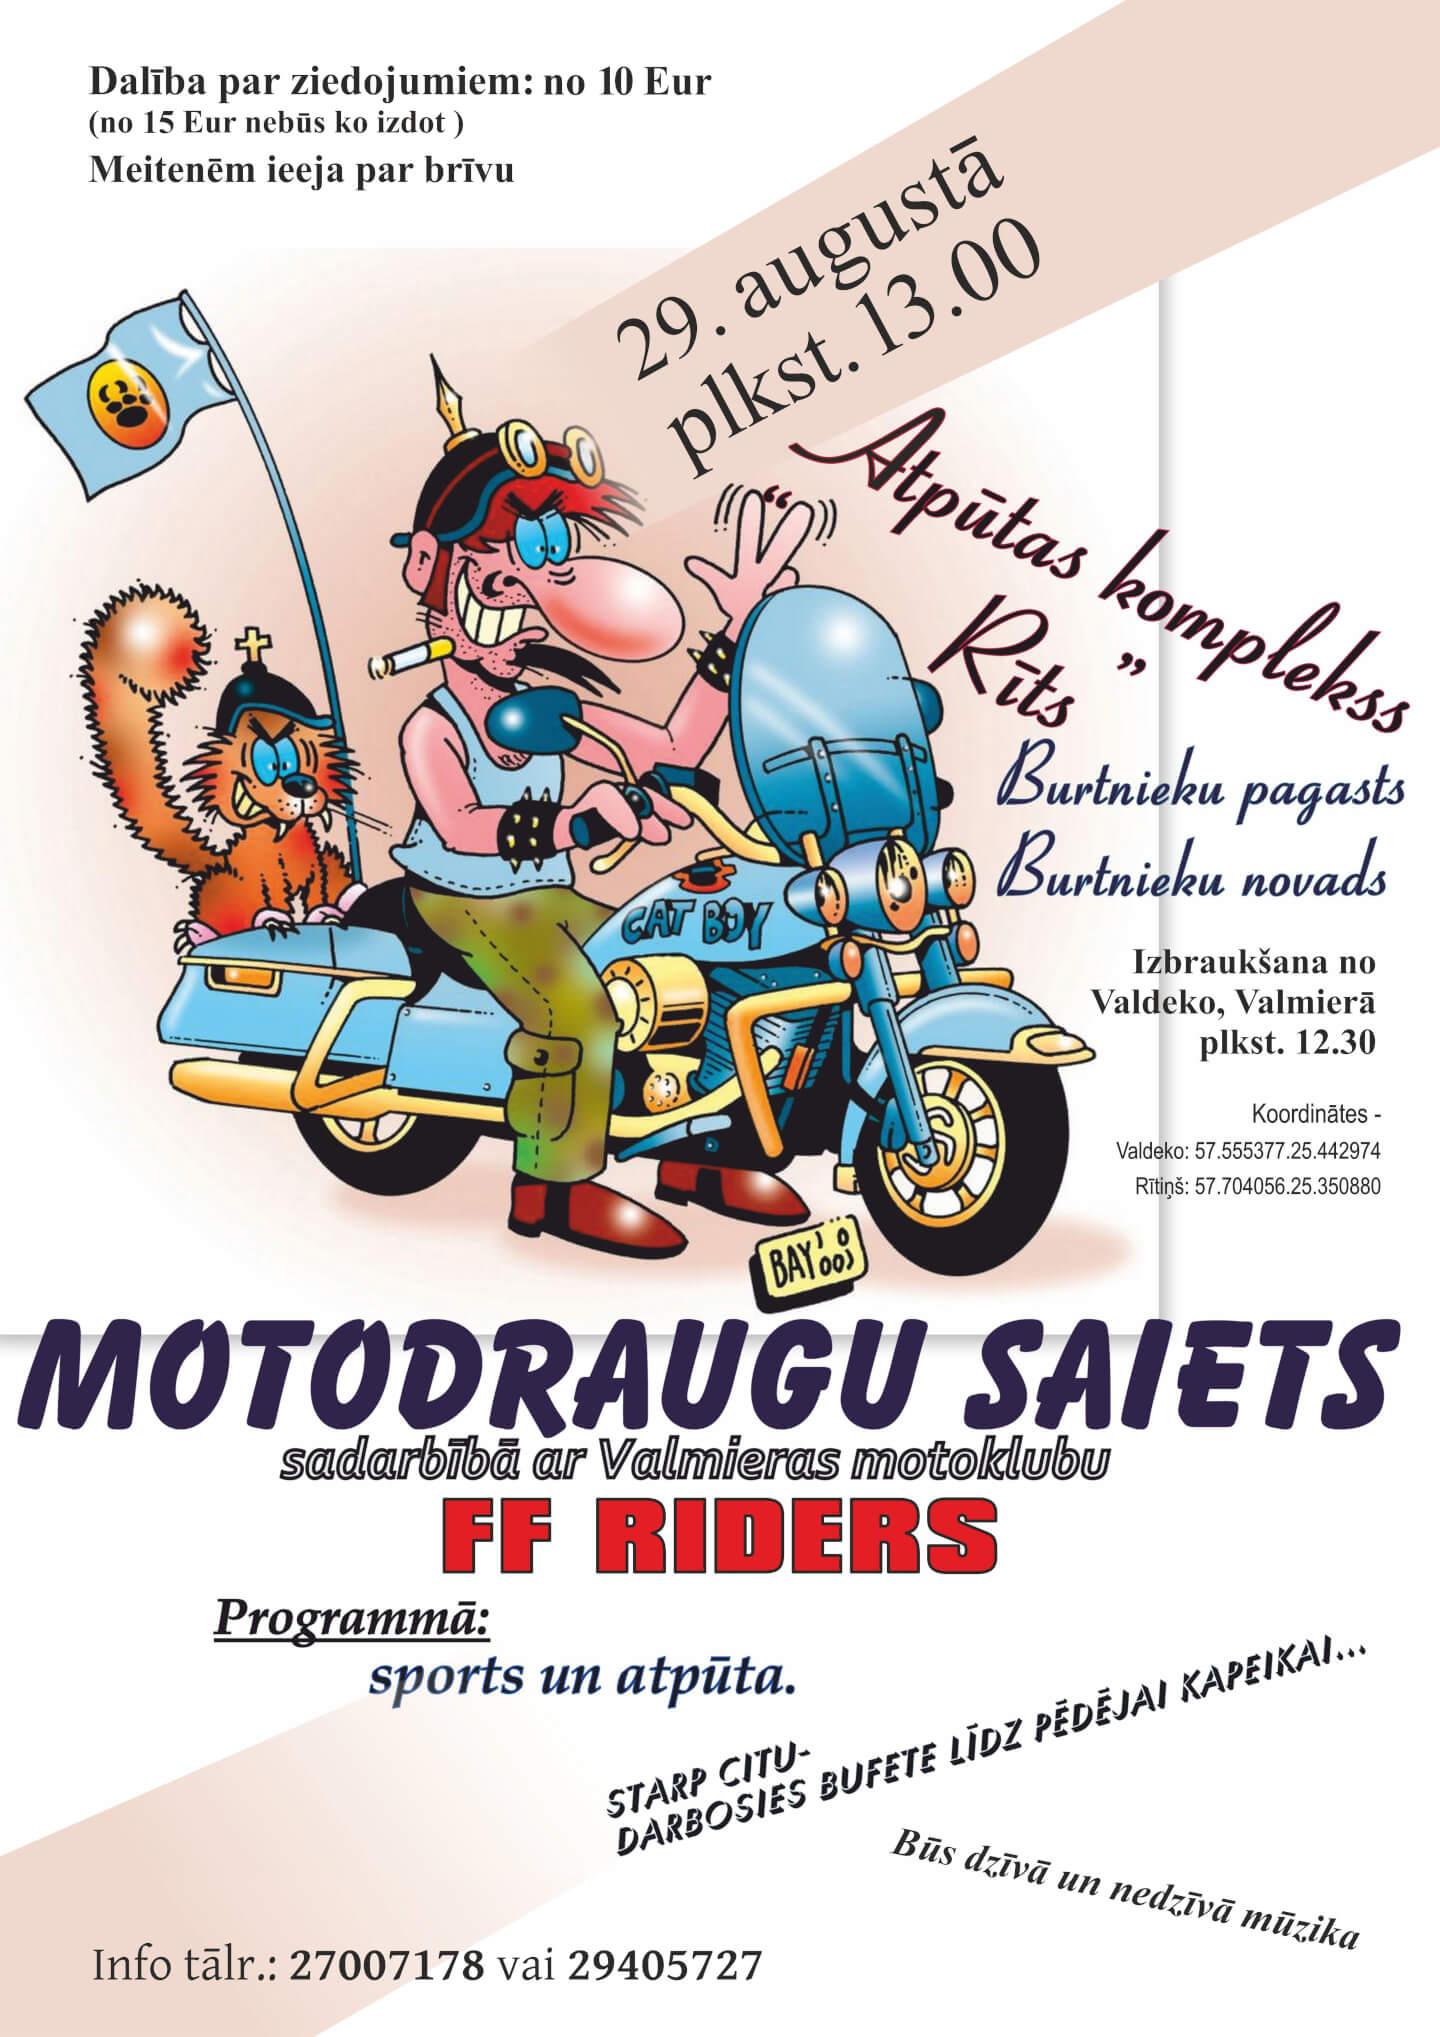 ffriders motodraugu saiets 2020